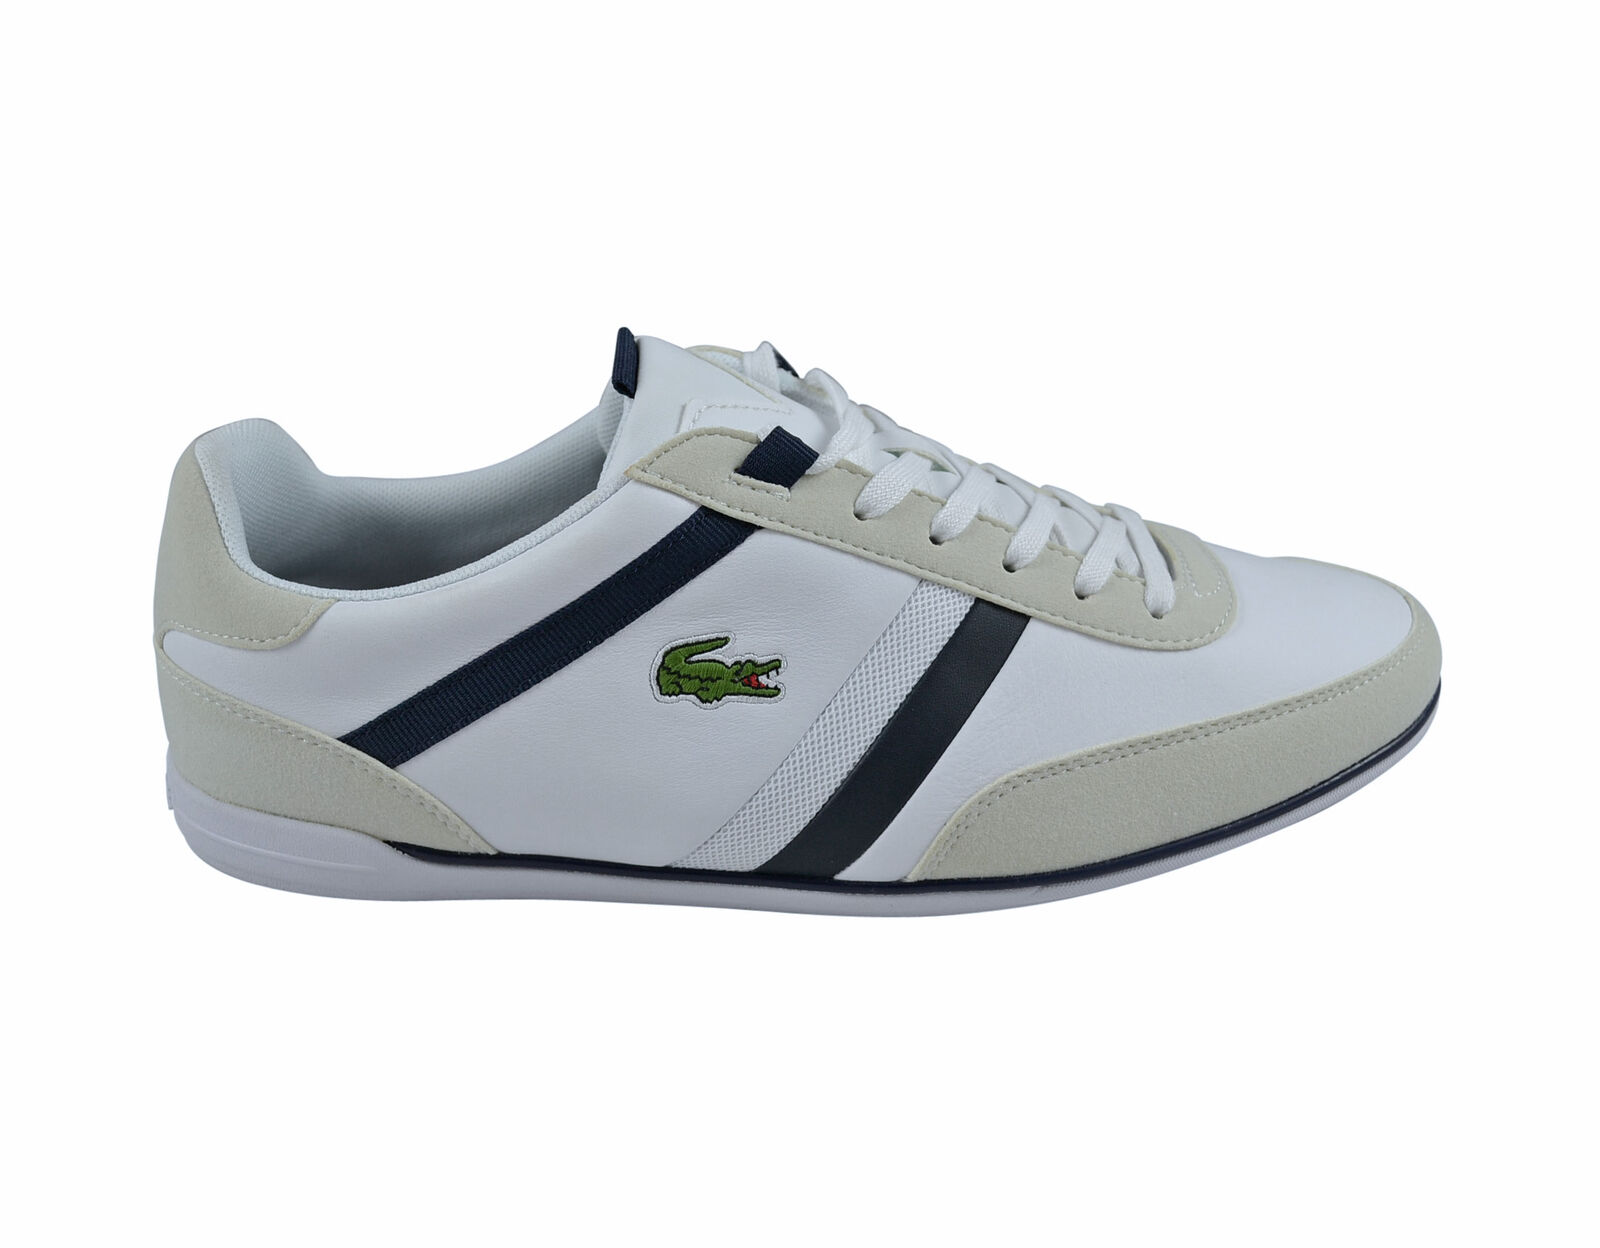 Lacoste white Giron 116 1 SPM white Lacoste Schuhe/Sneaker weiß 8295b8